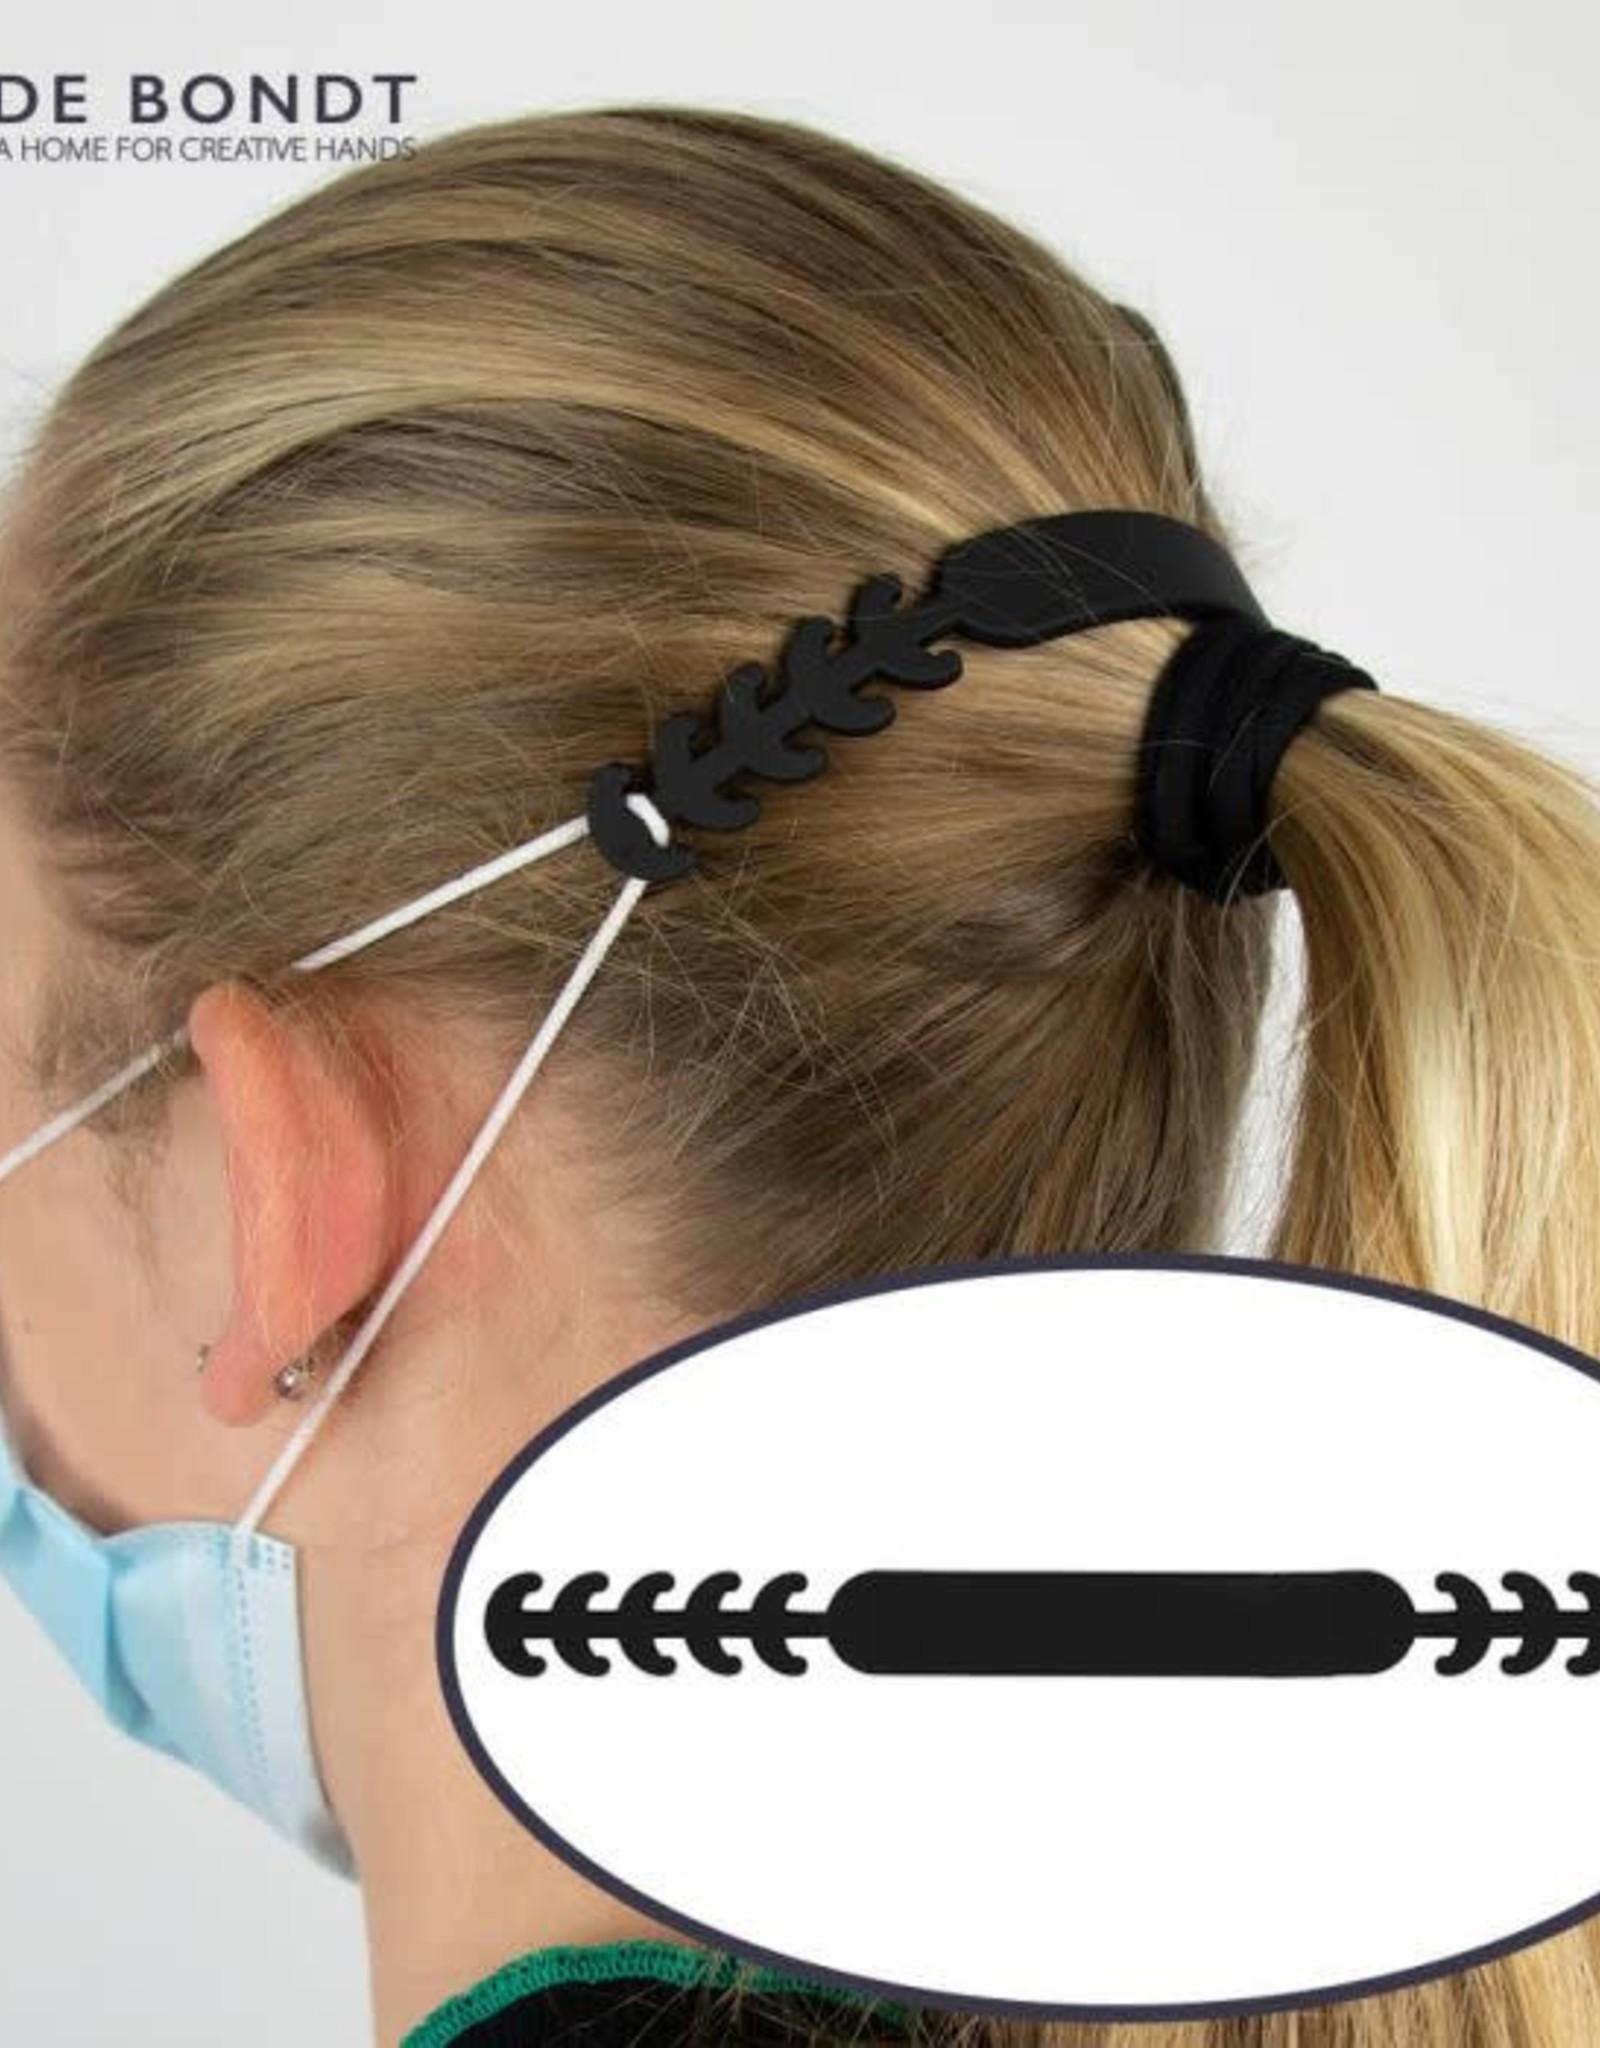 Siliconen oorbeschermers mondmasker roze